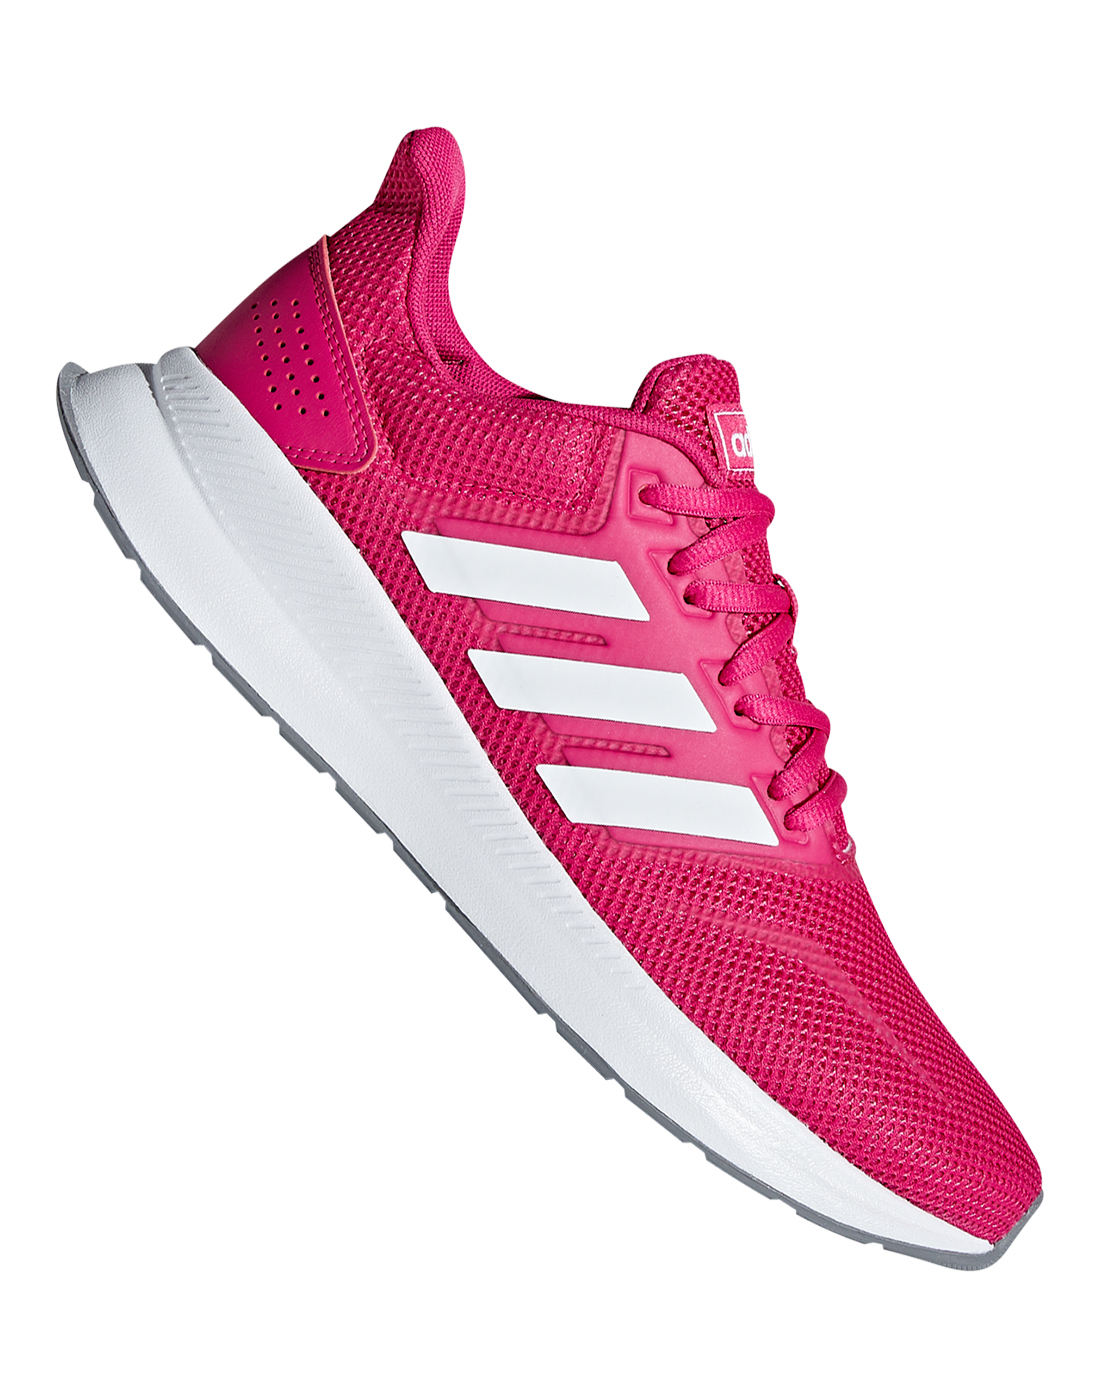 5df568623b7e Women s Pink adidas Falcon